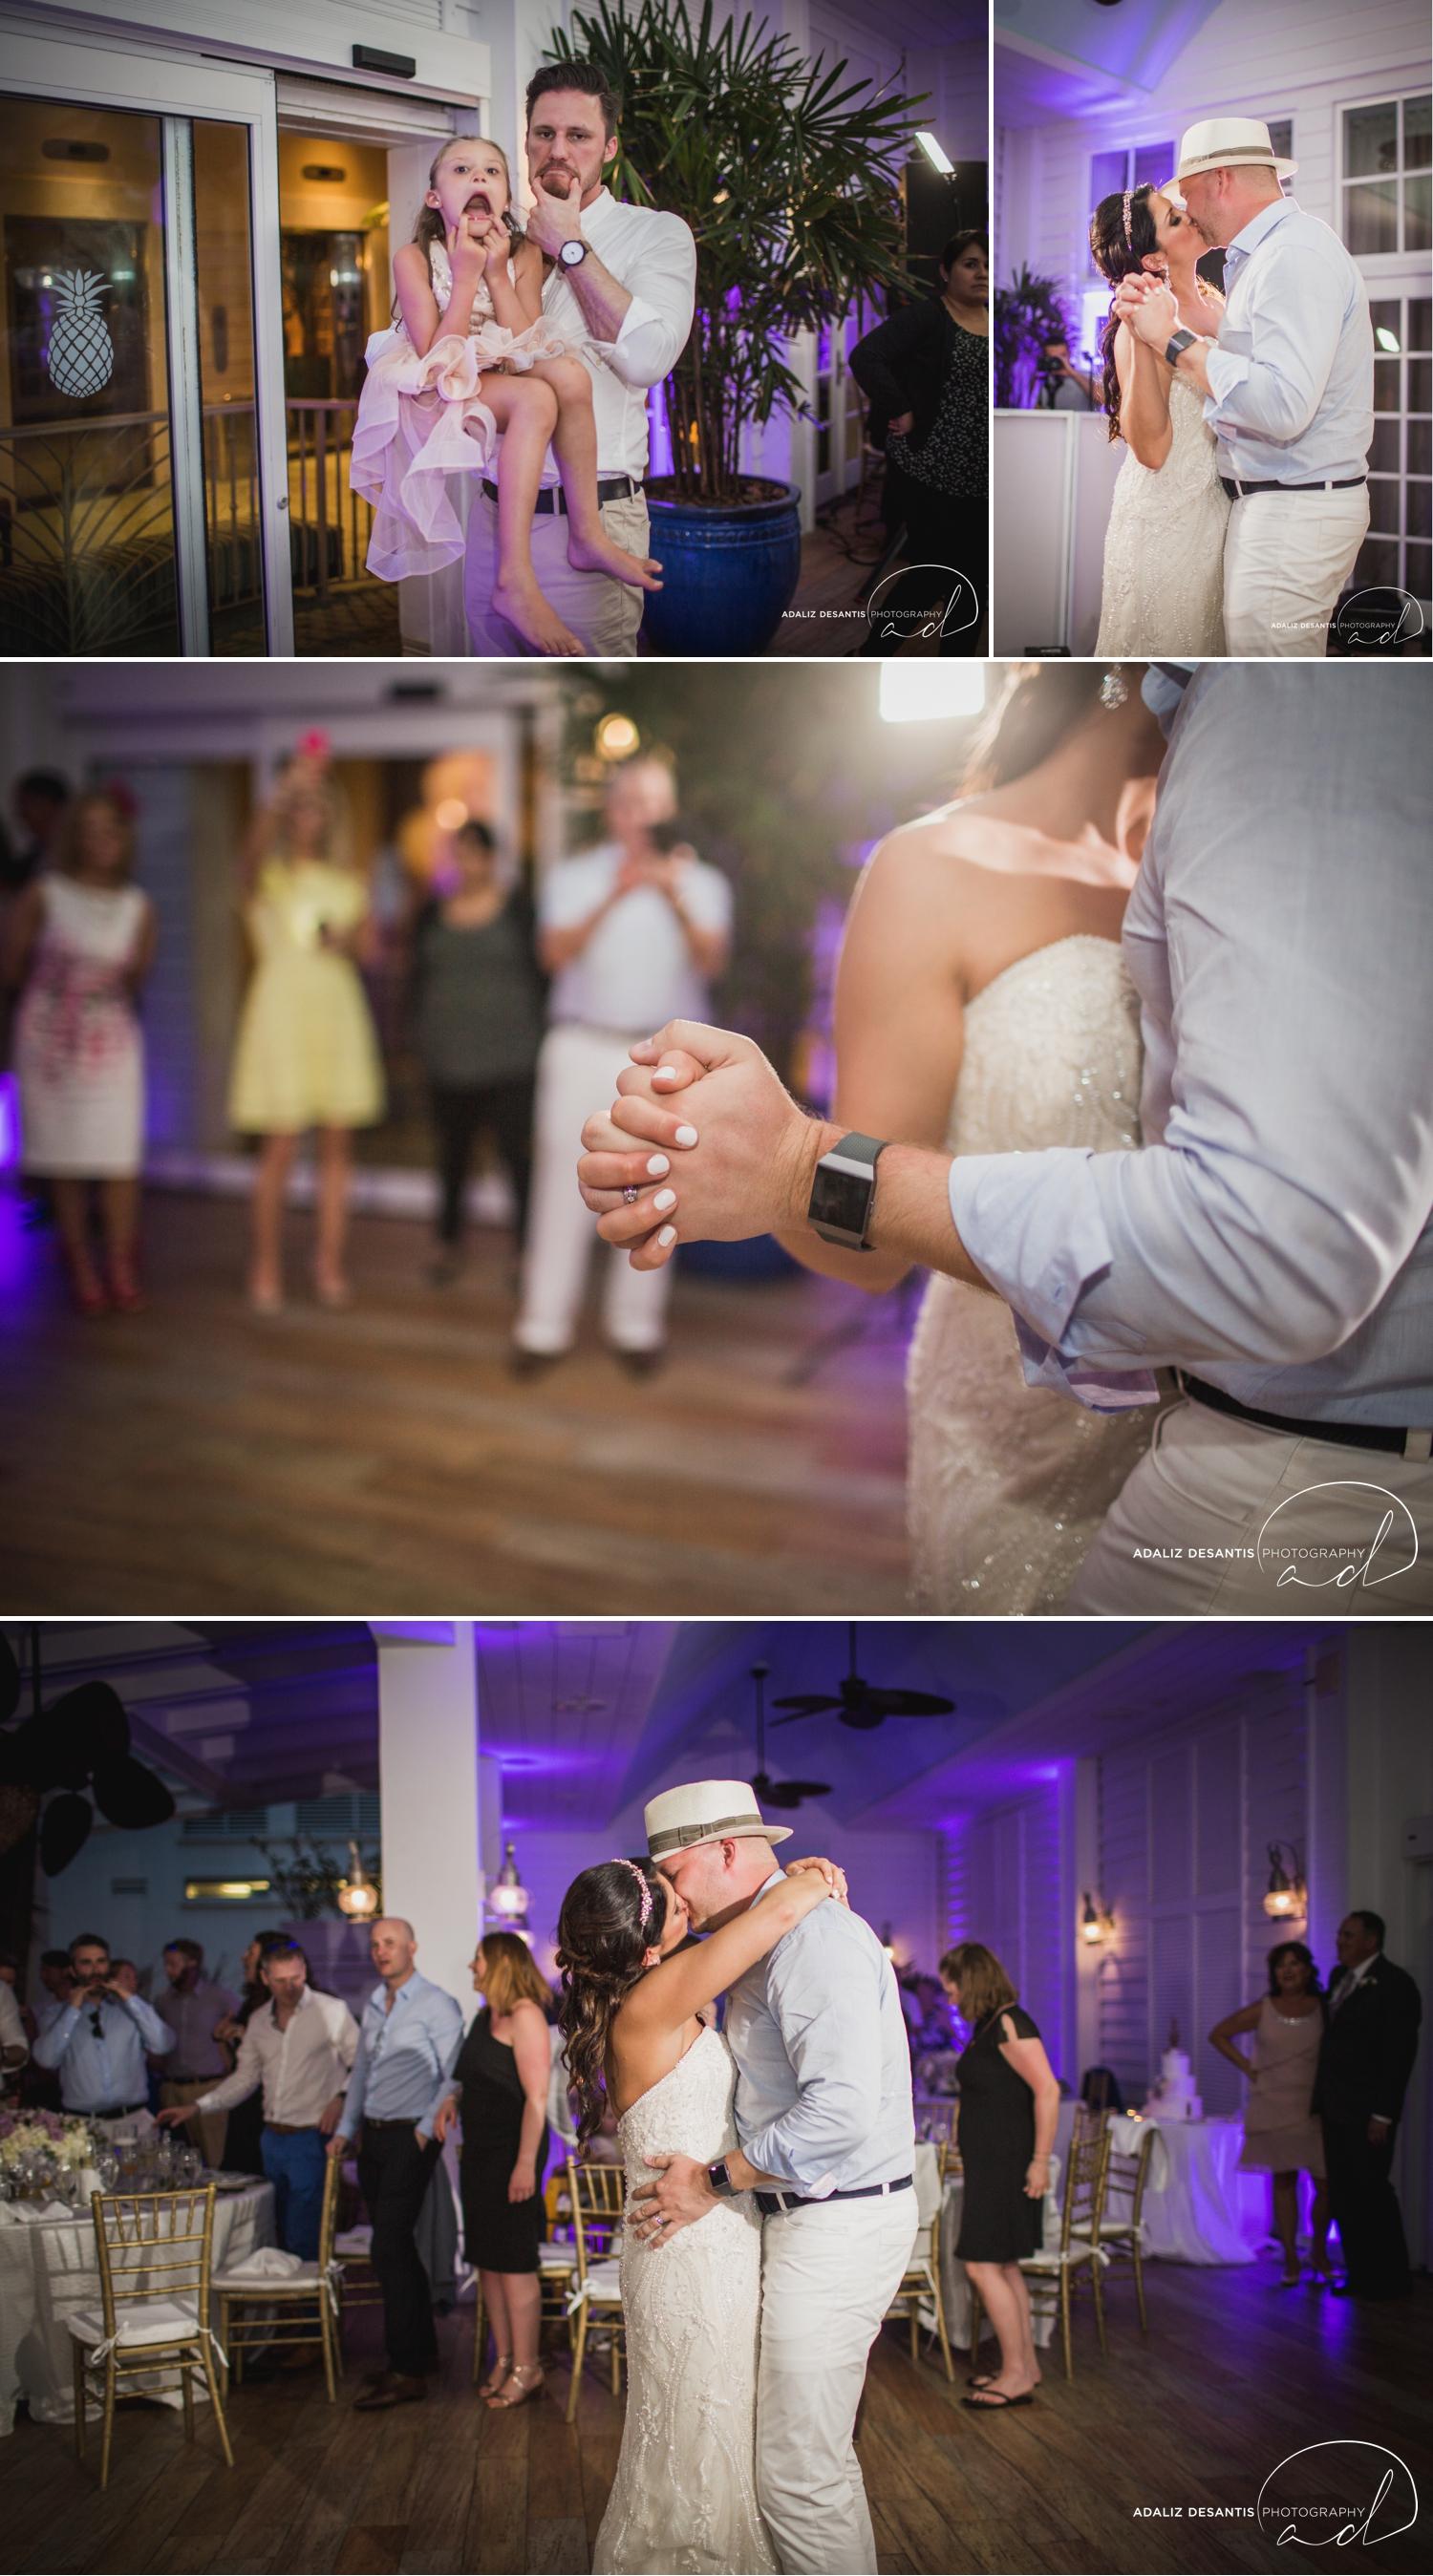 Carmen Alex palms hotel spa miami beach destination wedding lavender roses cuban cigar England cuba bride rose gold elegant Maggie Sottero Badgley Mischka 21.jpg